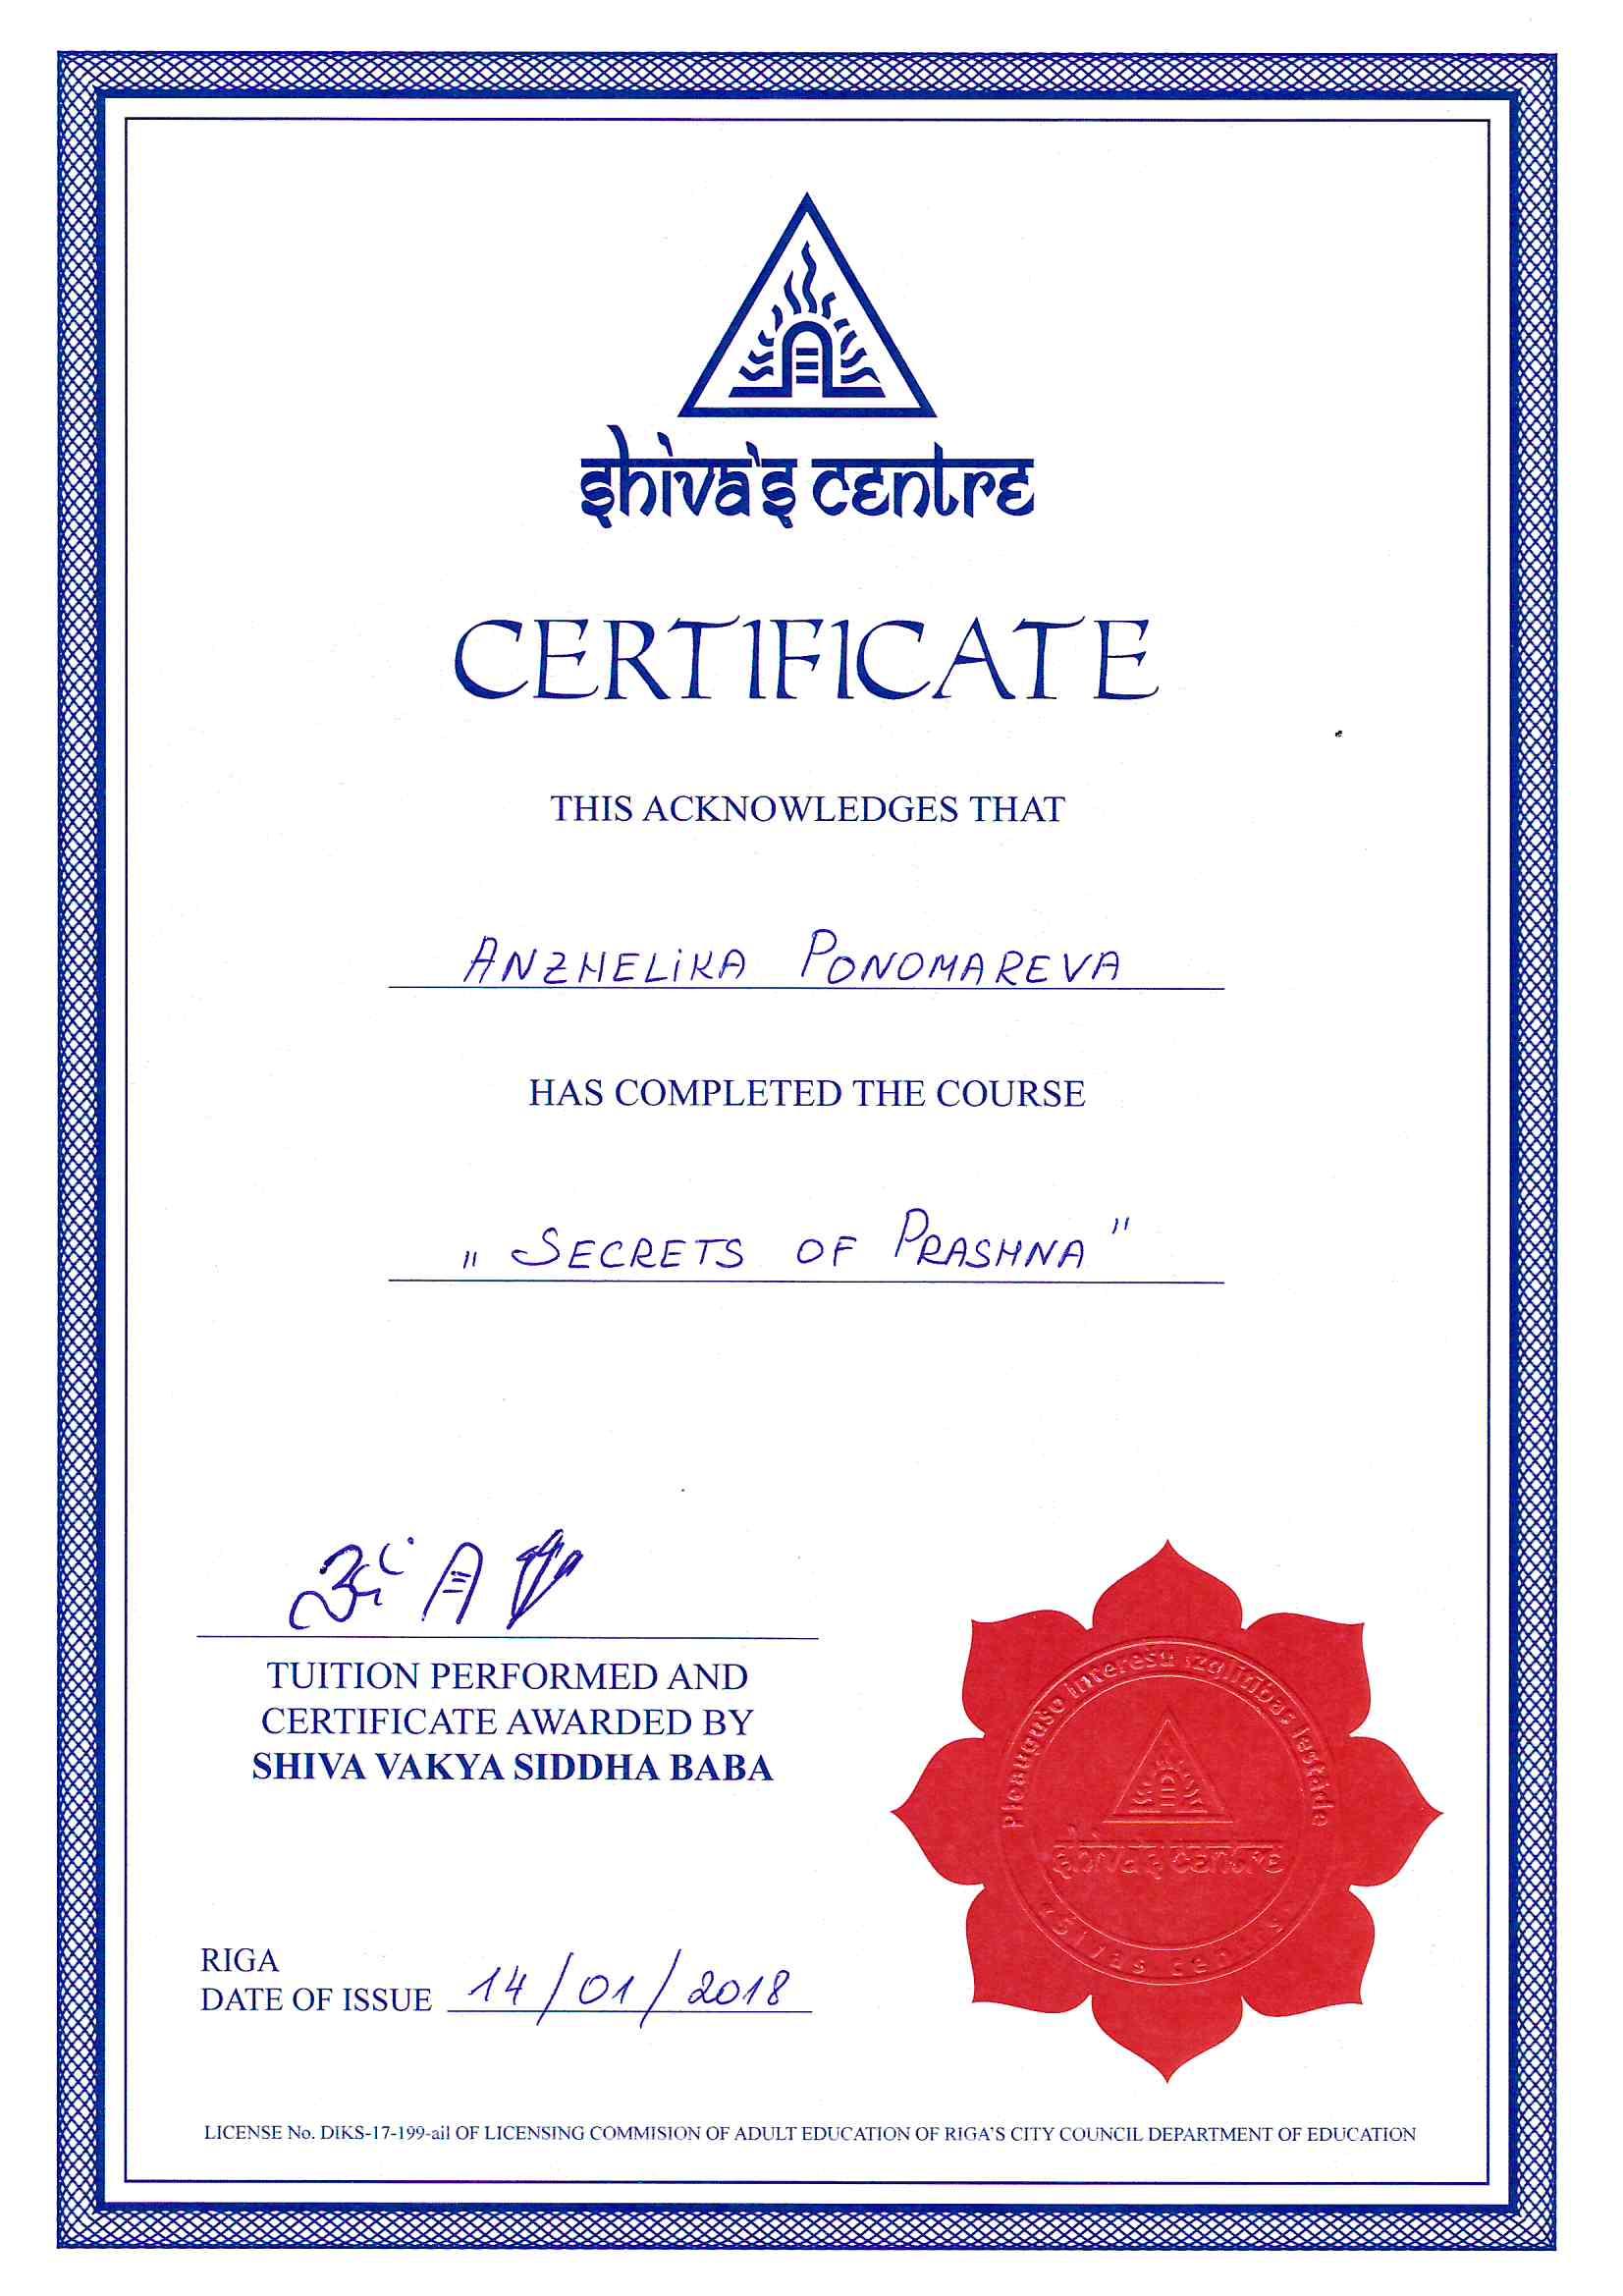 Шива Вакья Сиддха Баба /Shiva Vakya Siddha Baba